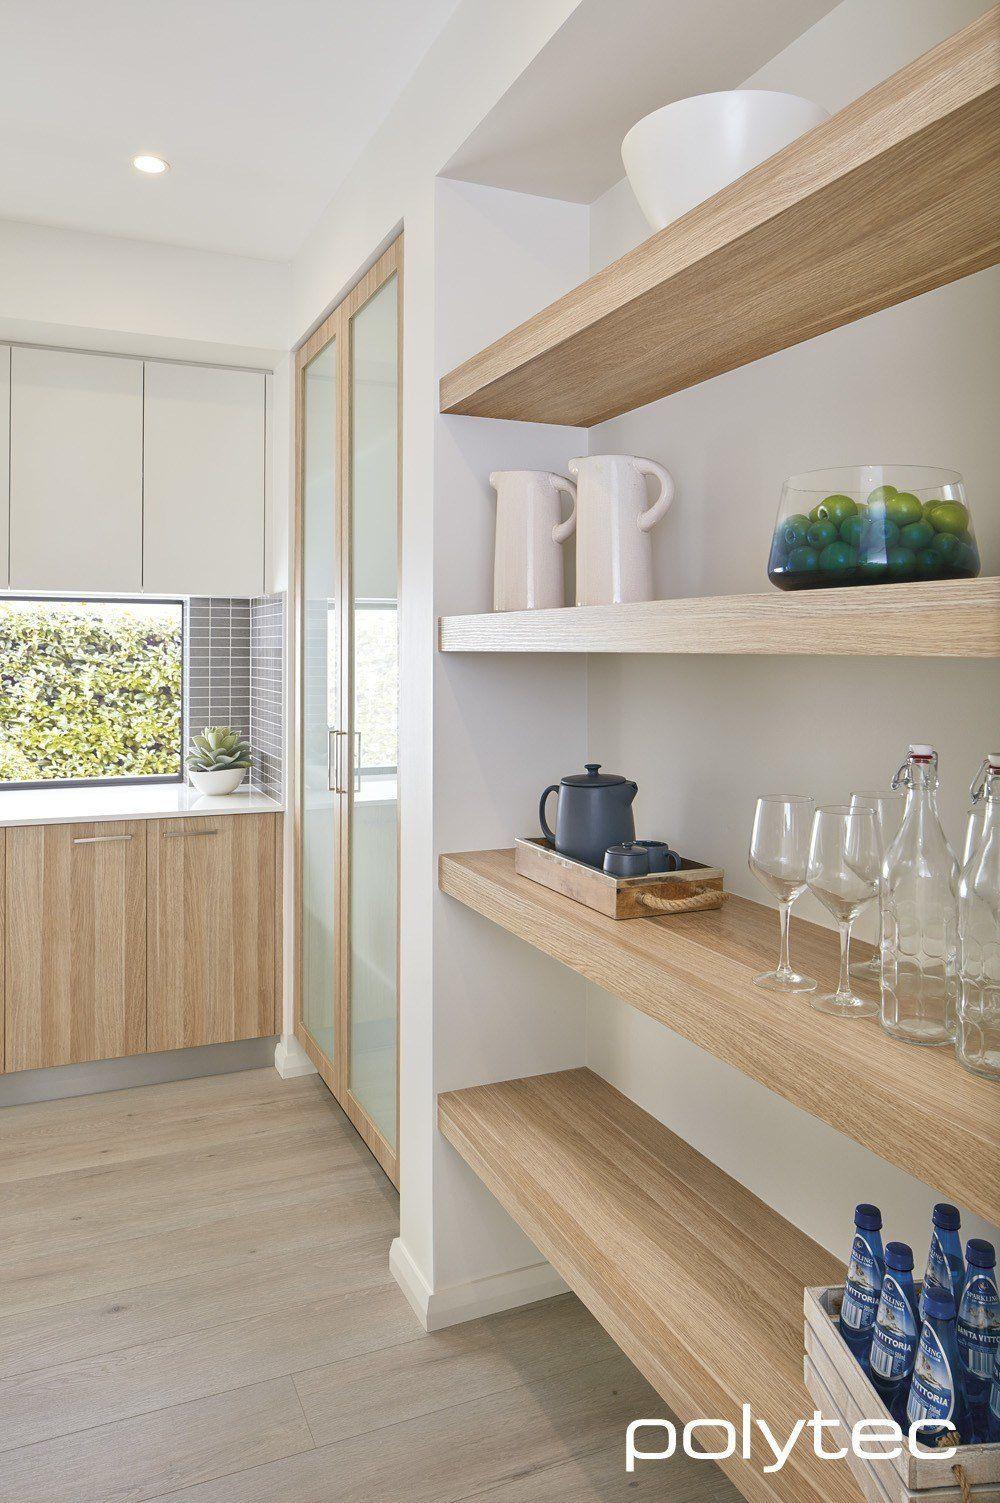 Shelving, base and pantry doors in Natural Oak Ravine